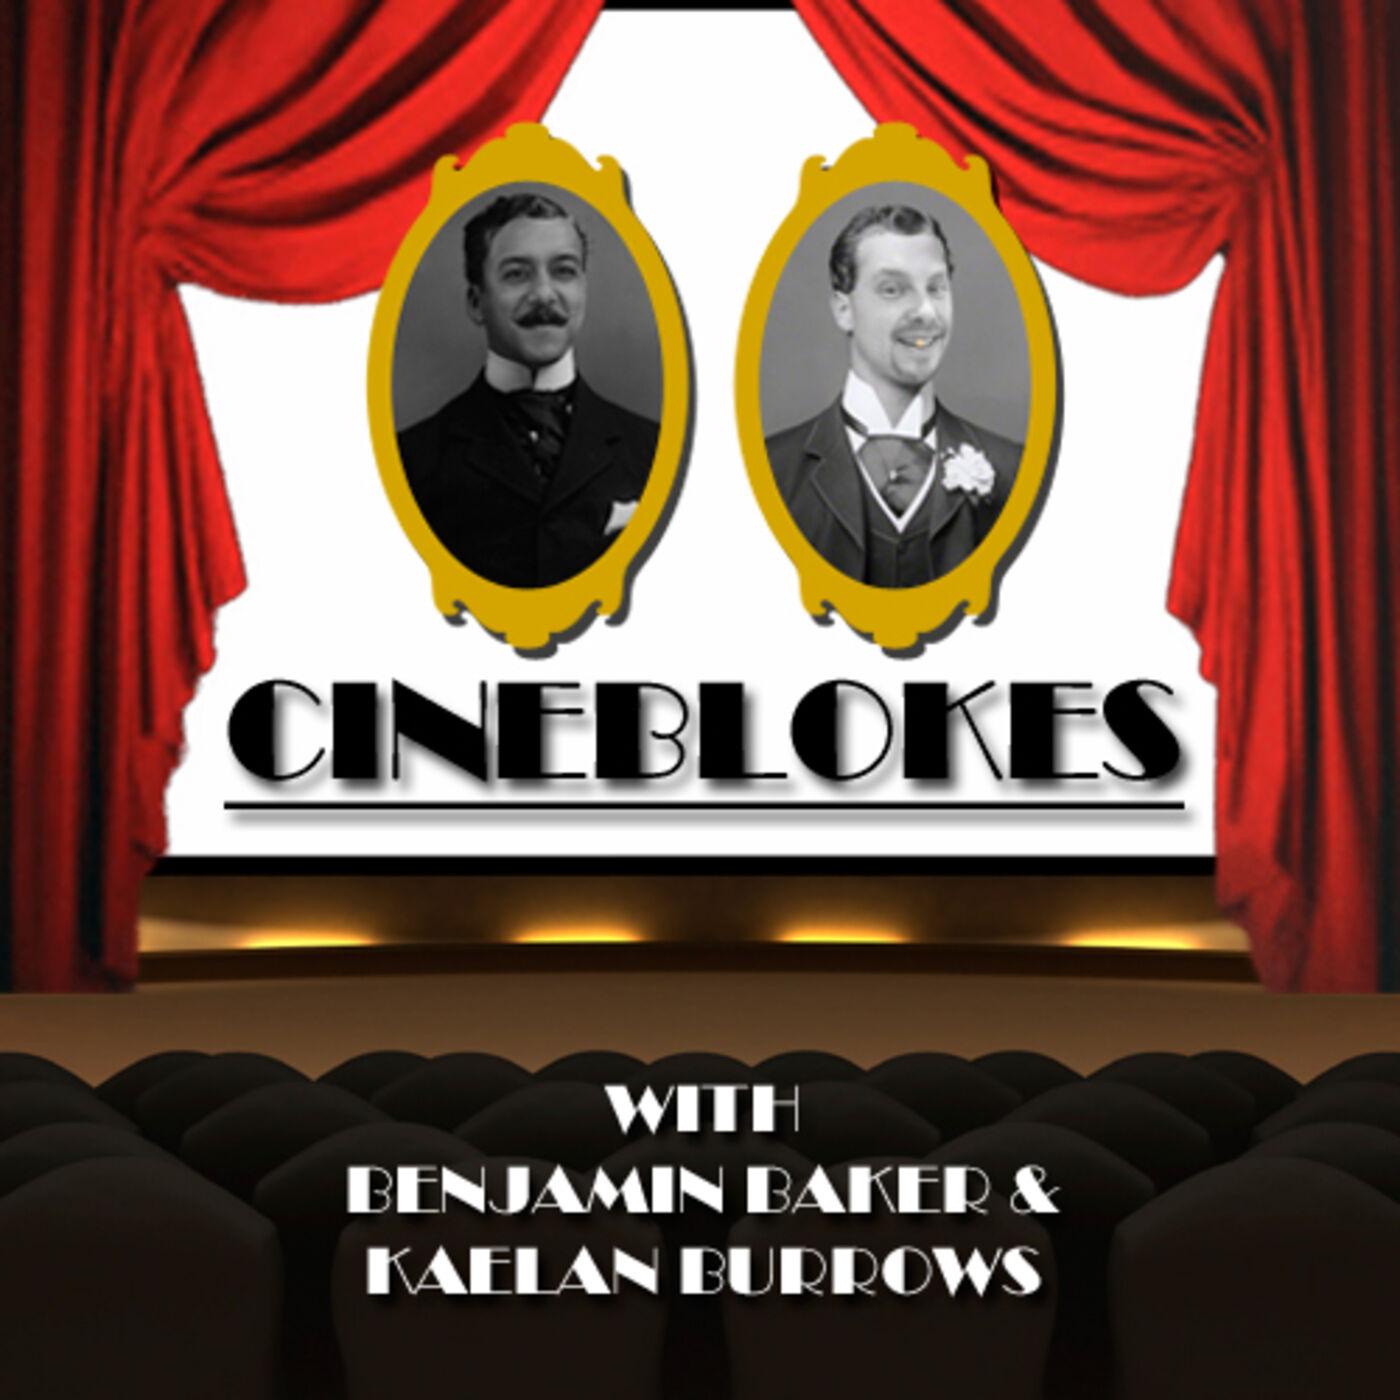 Cineblokes Episode 144 - Jungle Cruise